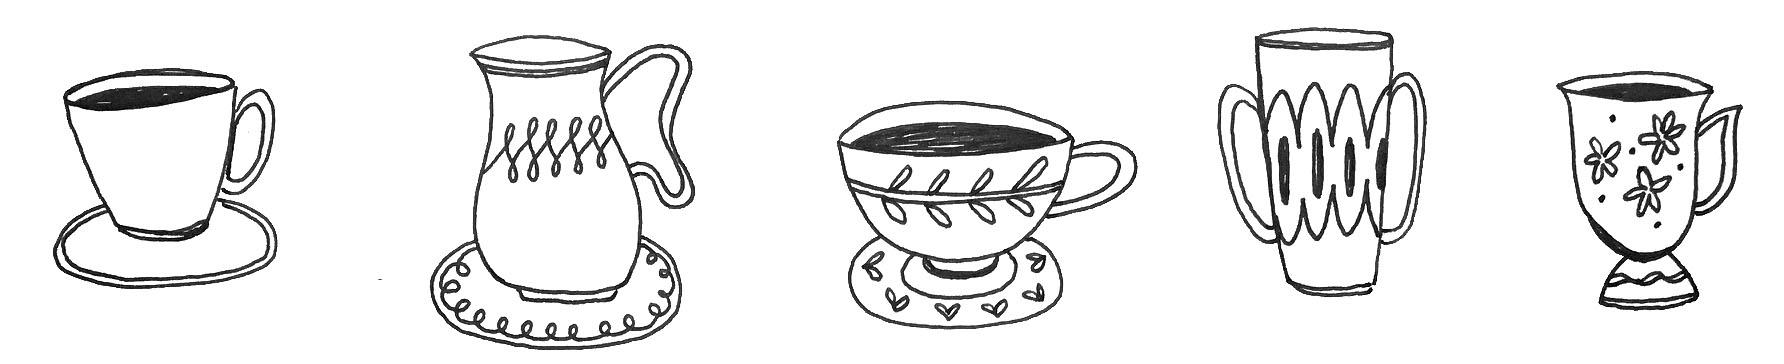 cups05.jpg